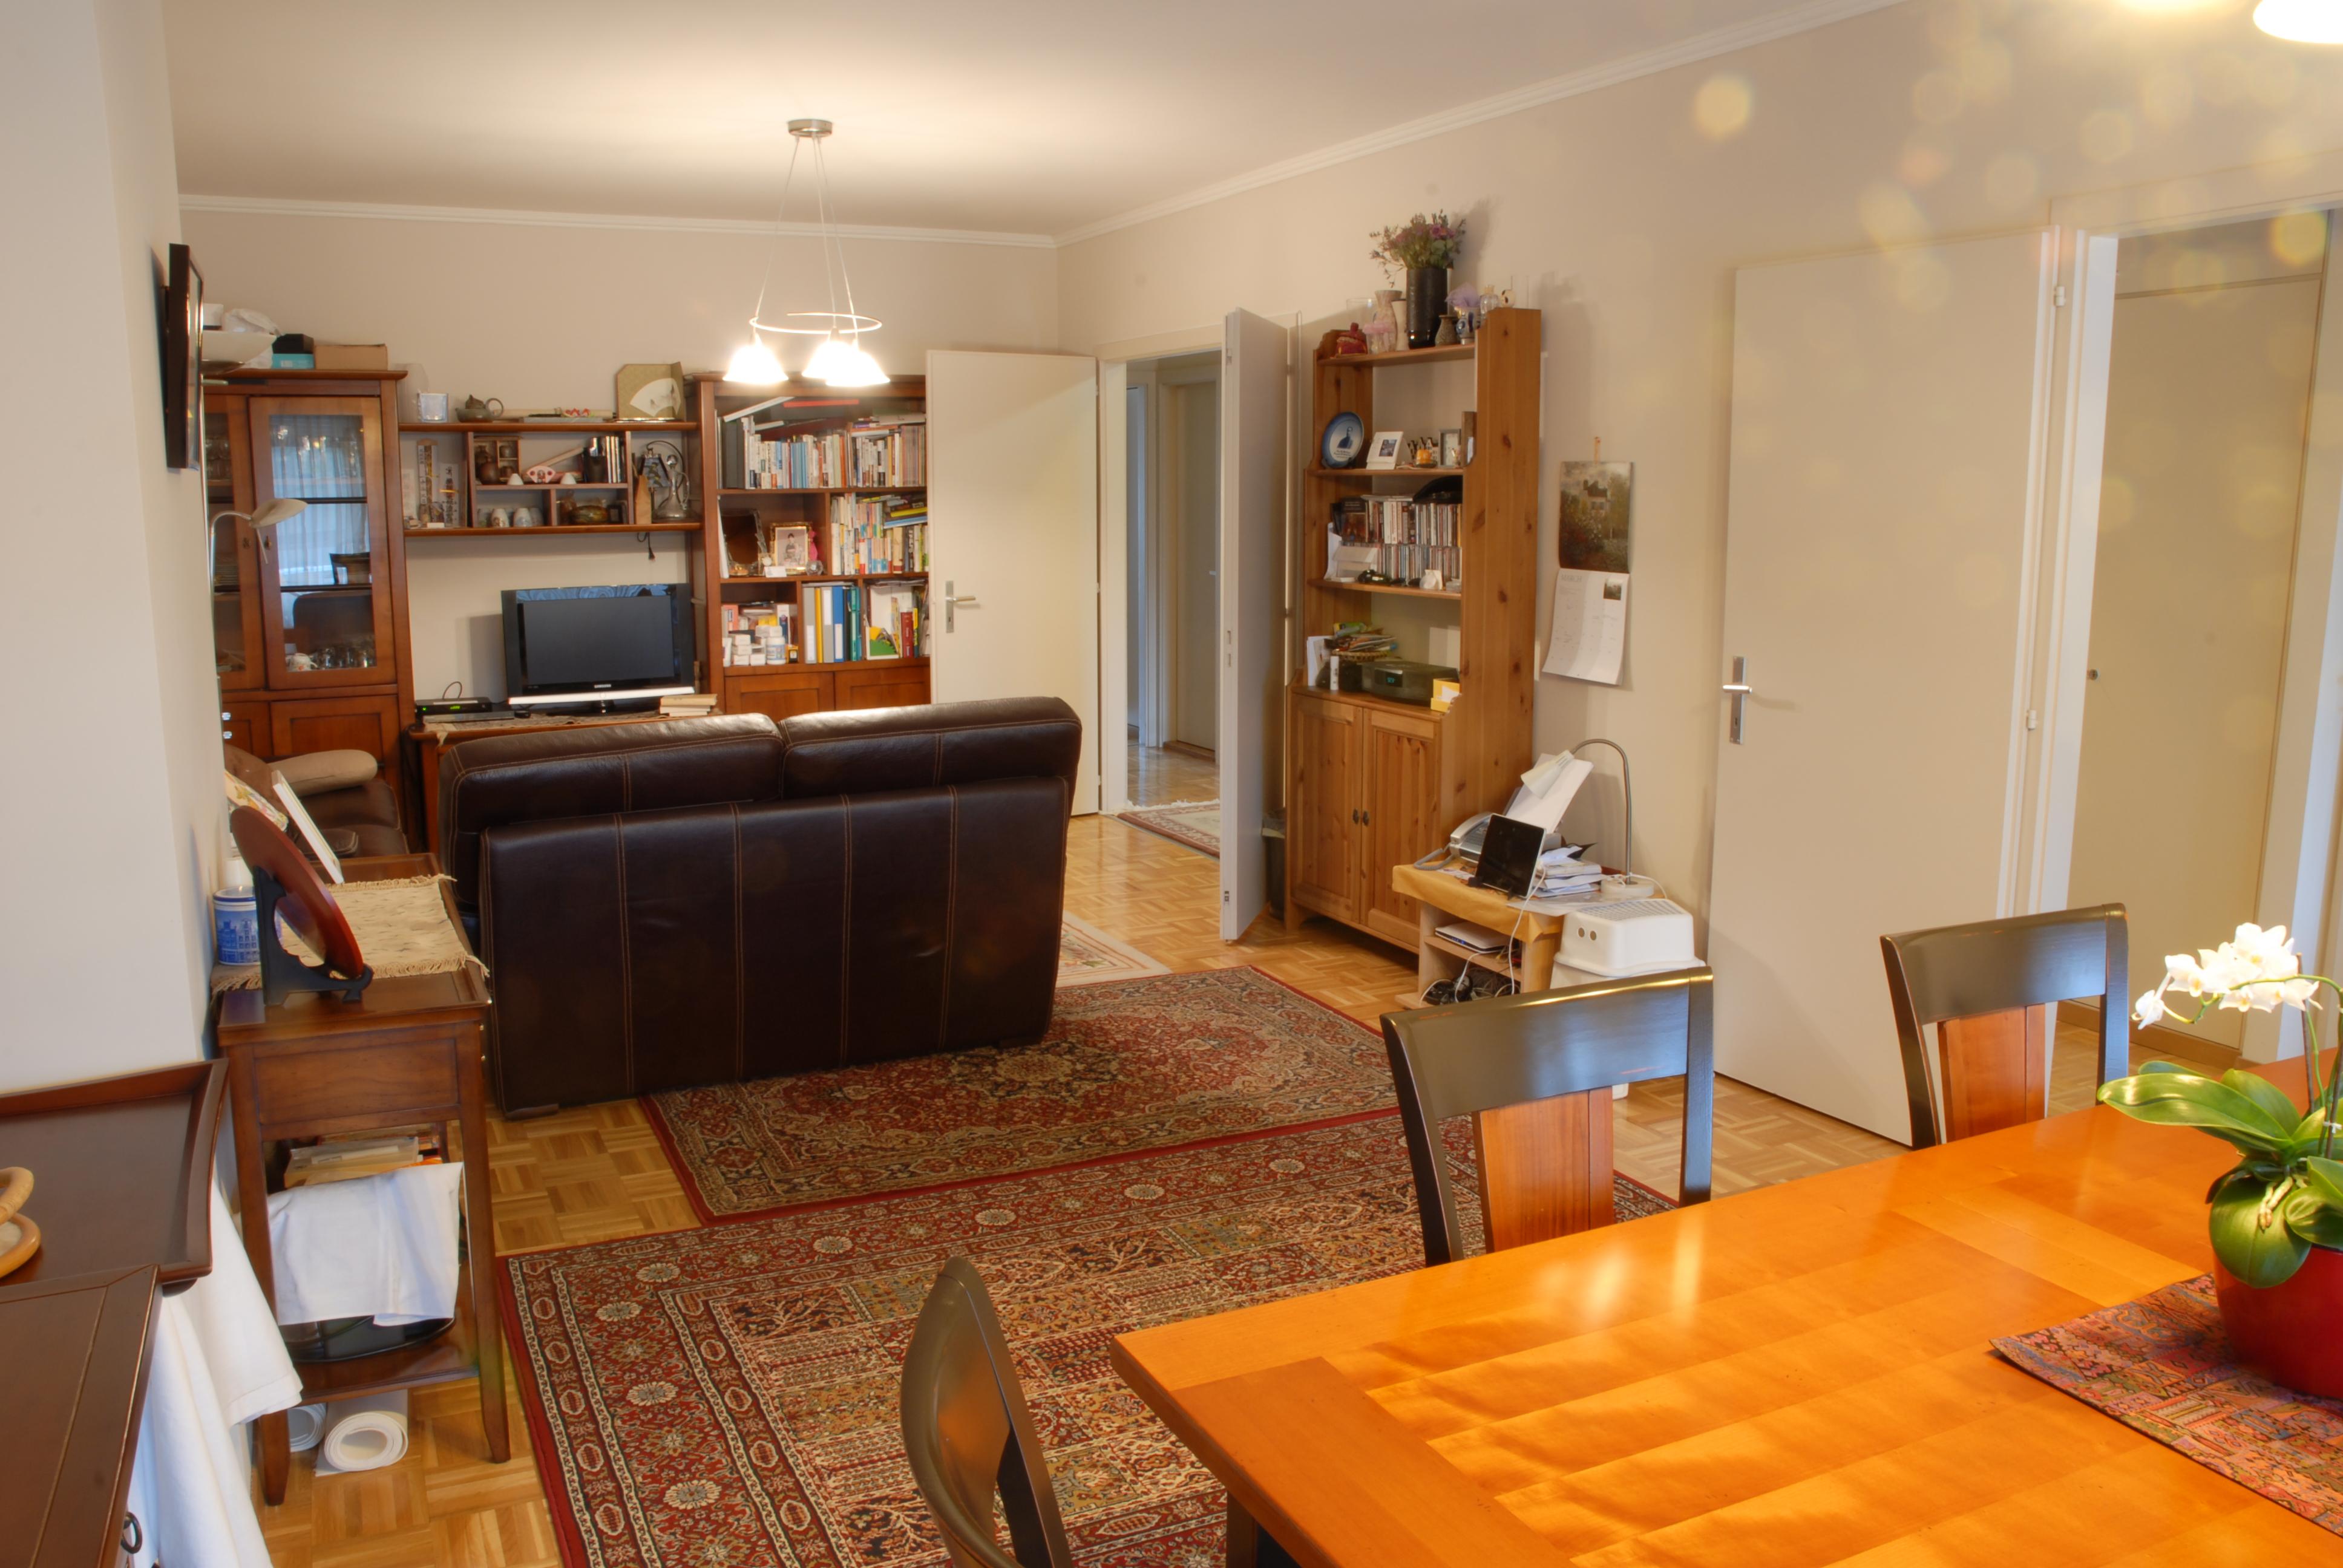 4.5 Rooms Furnished Apartment In Petit Saconnex